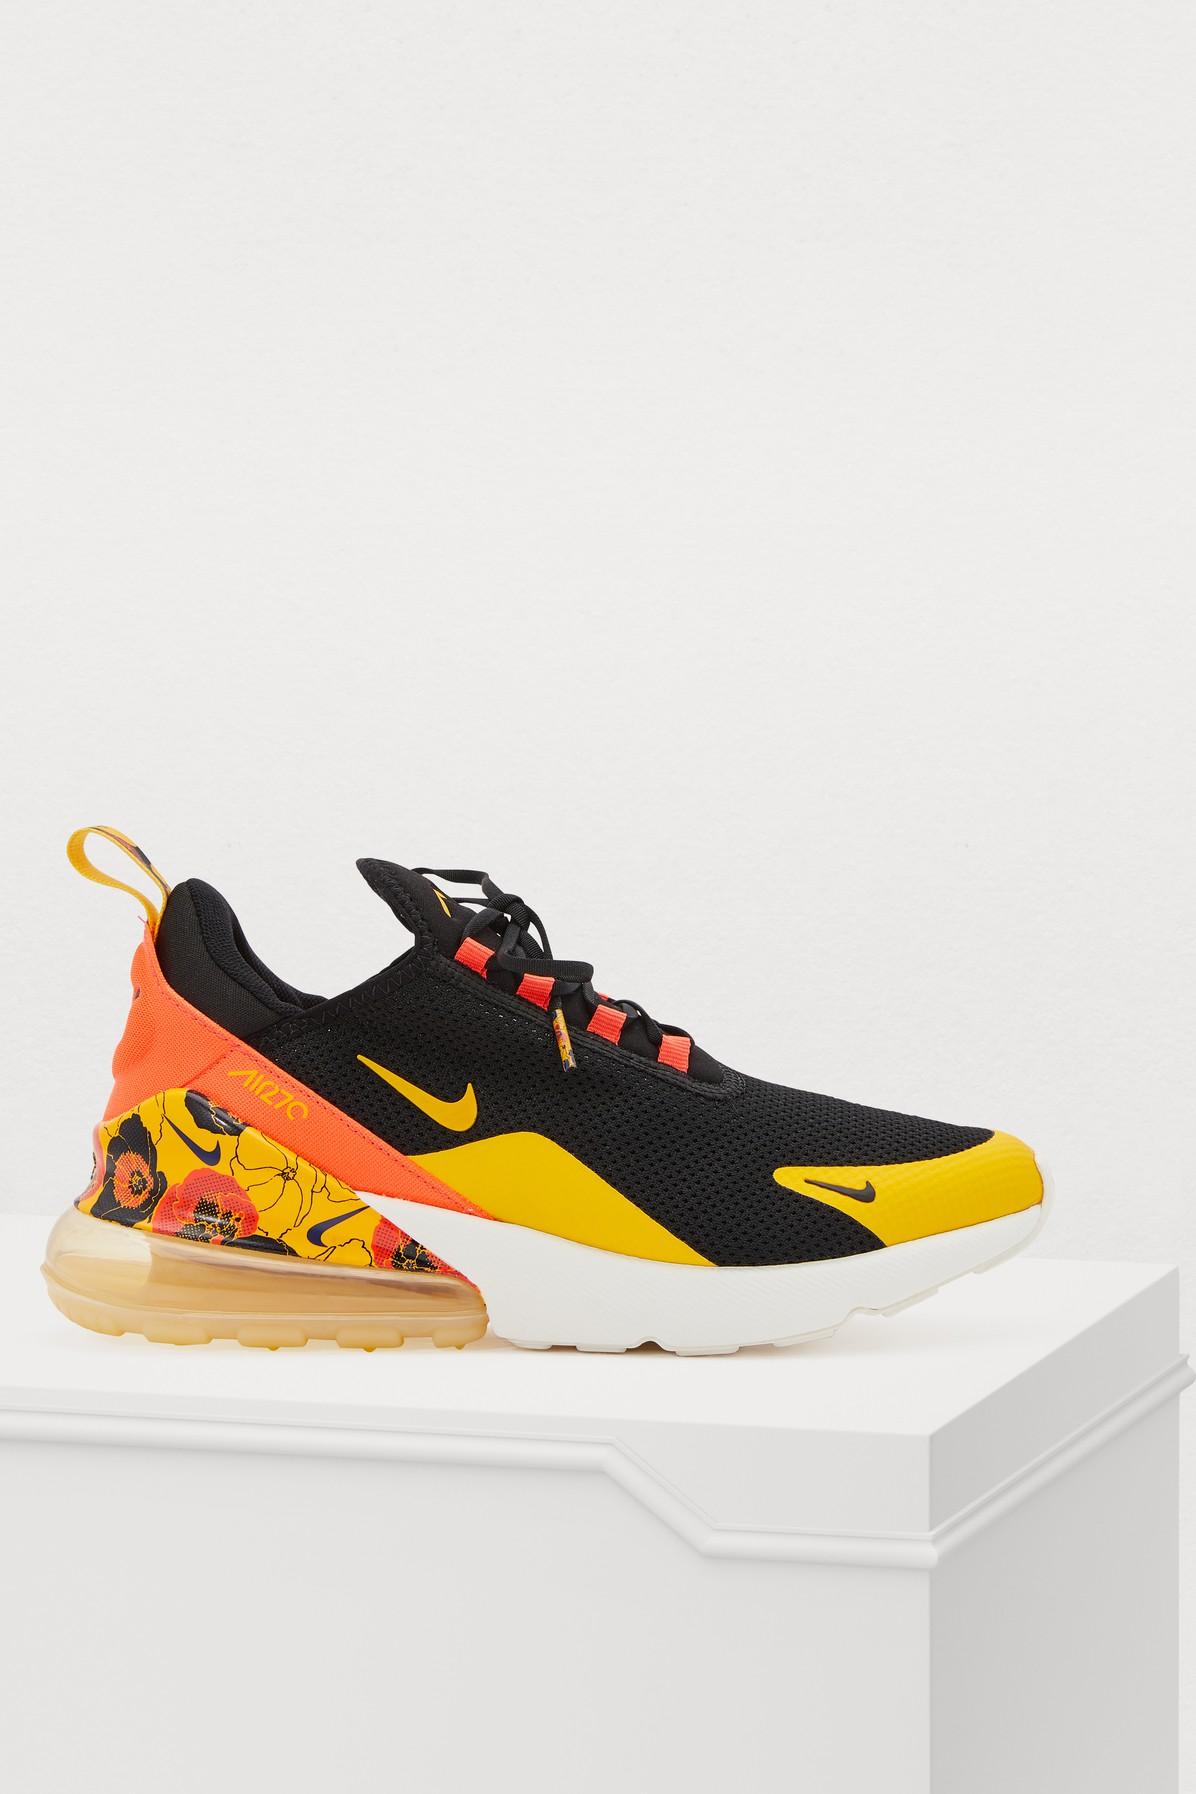 Nike Air Max 270 Black University Gold Bright Crimson AR0499